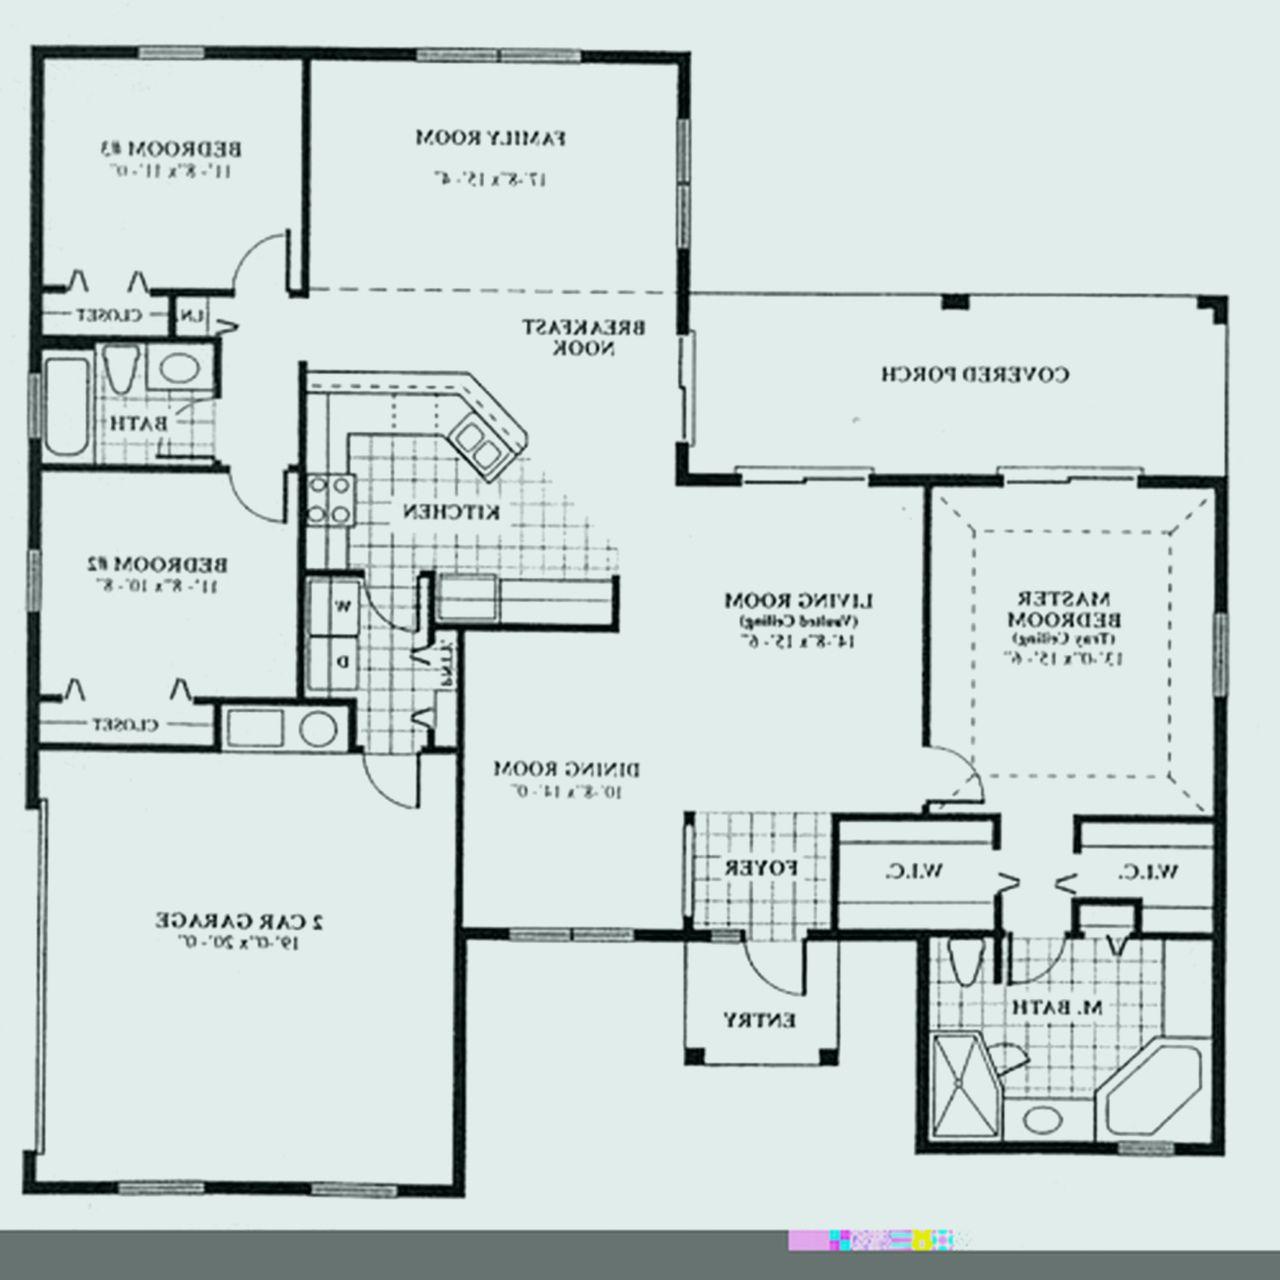 28 House Floor Plan Generator 2019 Barn Homes Floor Plans Floor Plan Design Drawing House Plans